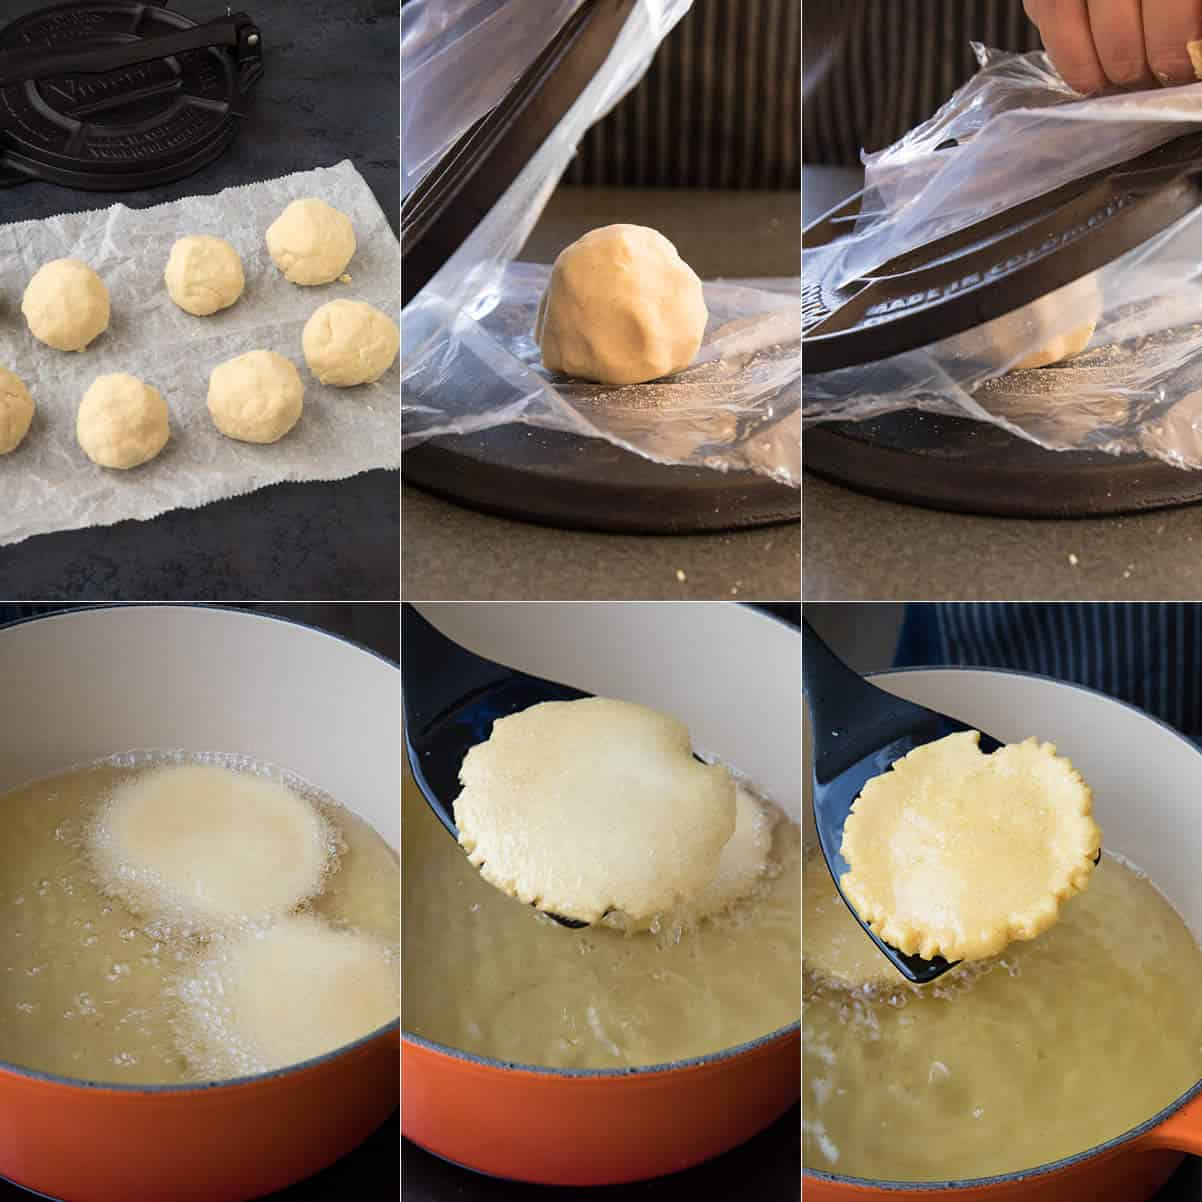 Making Mexican Gorditas